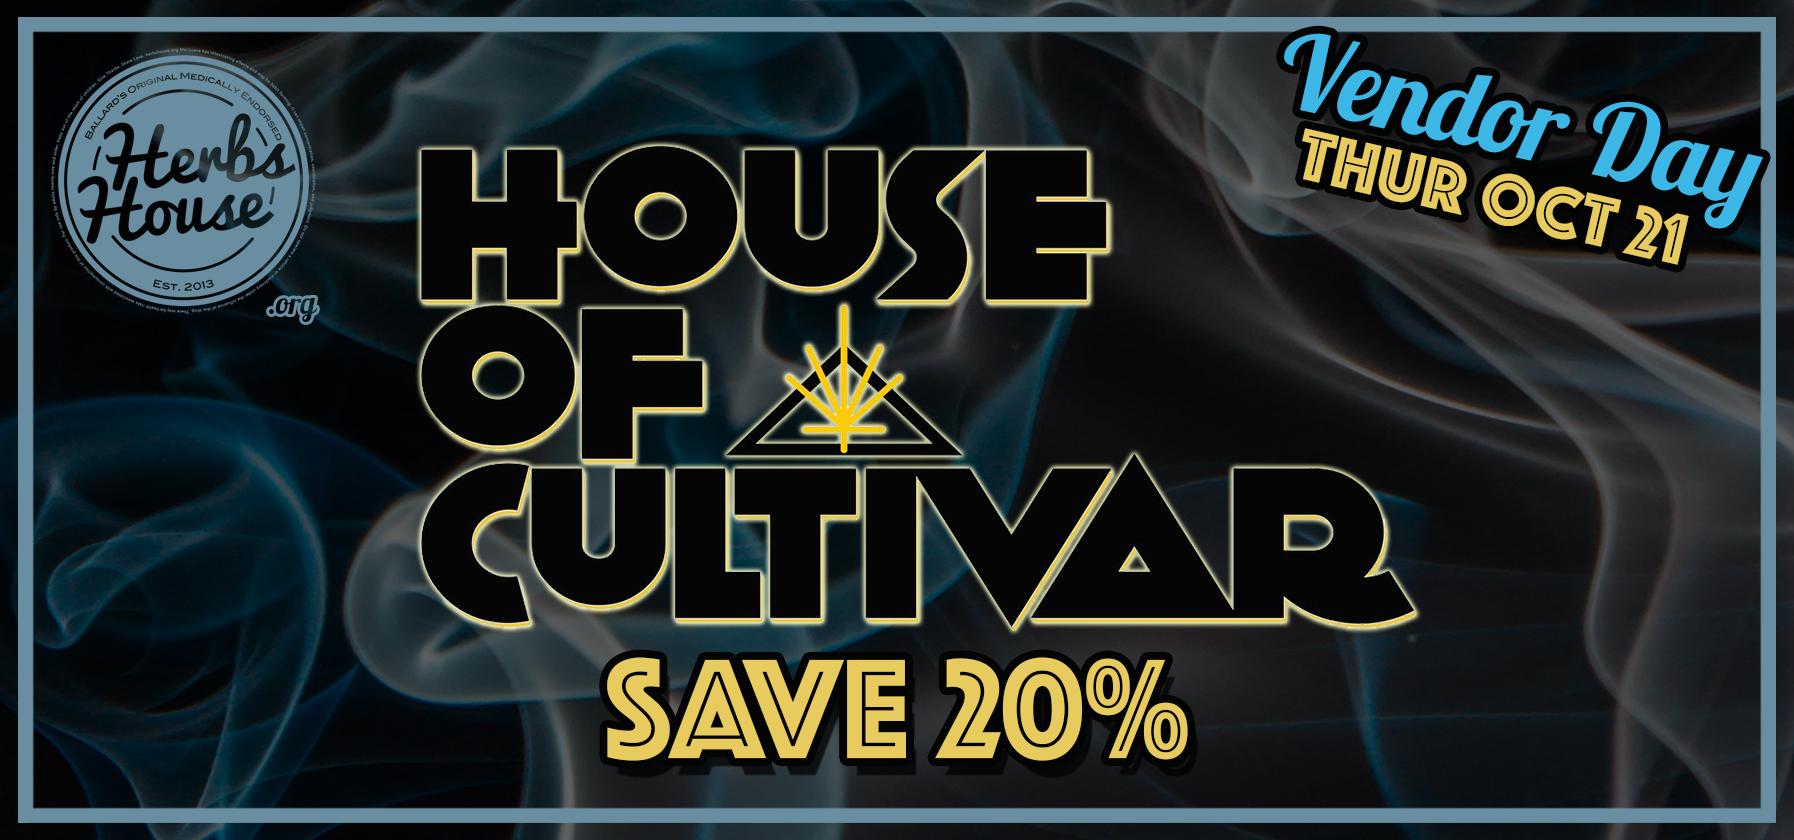 House of Cultivar Vendor Day Oct 21 SAVE 20%